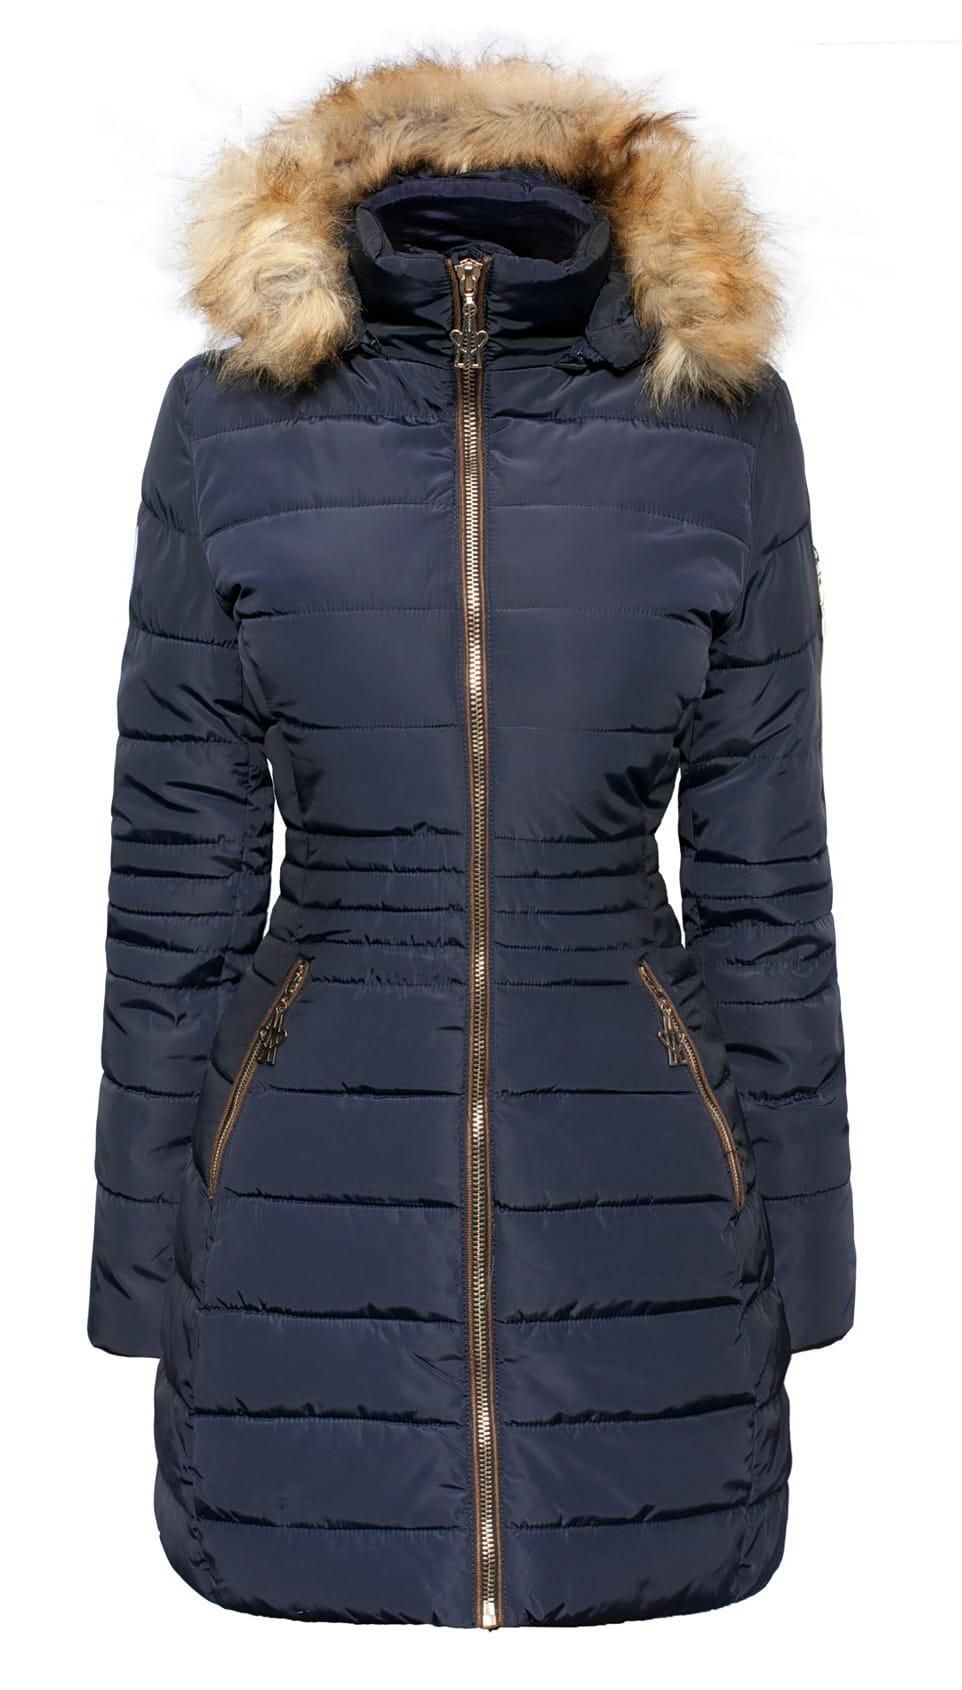 damska długa kurtka zimowa